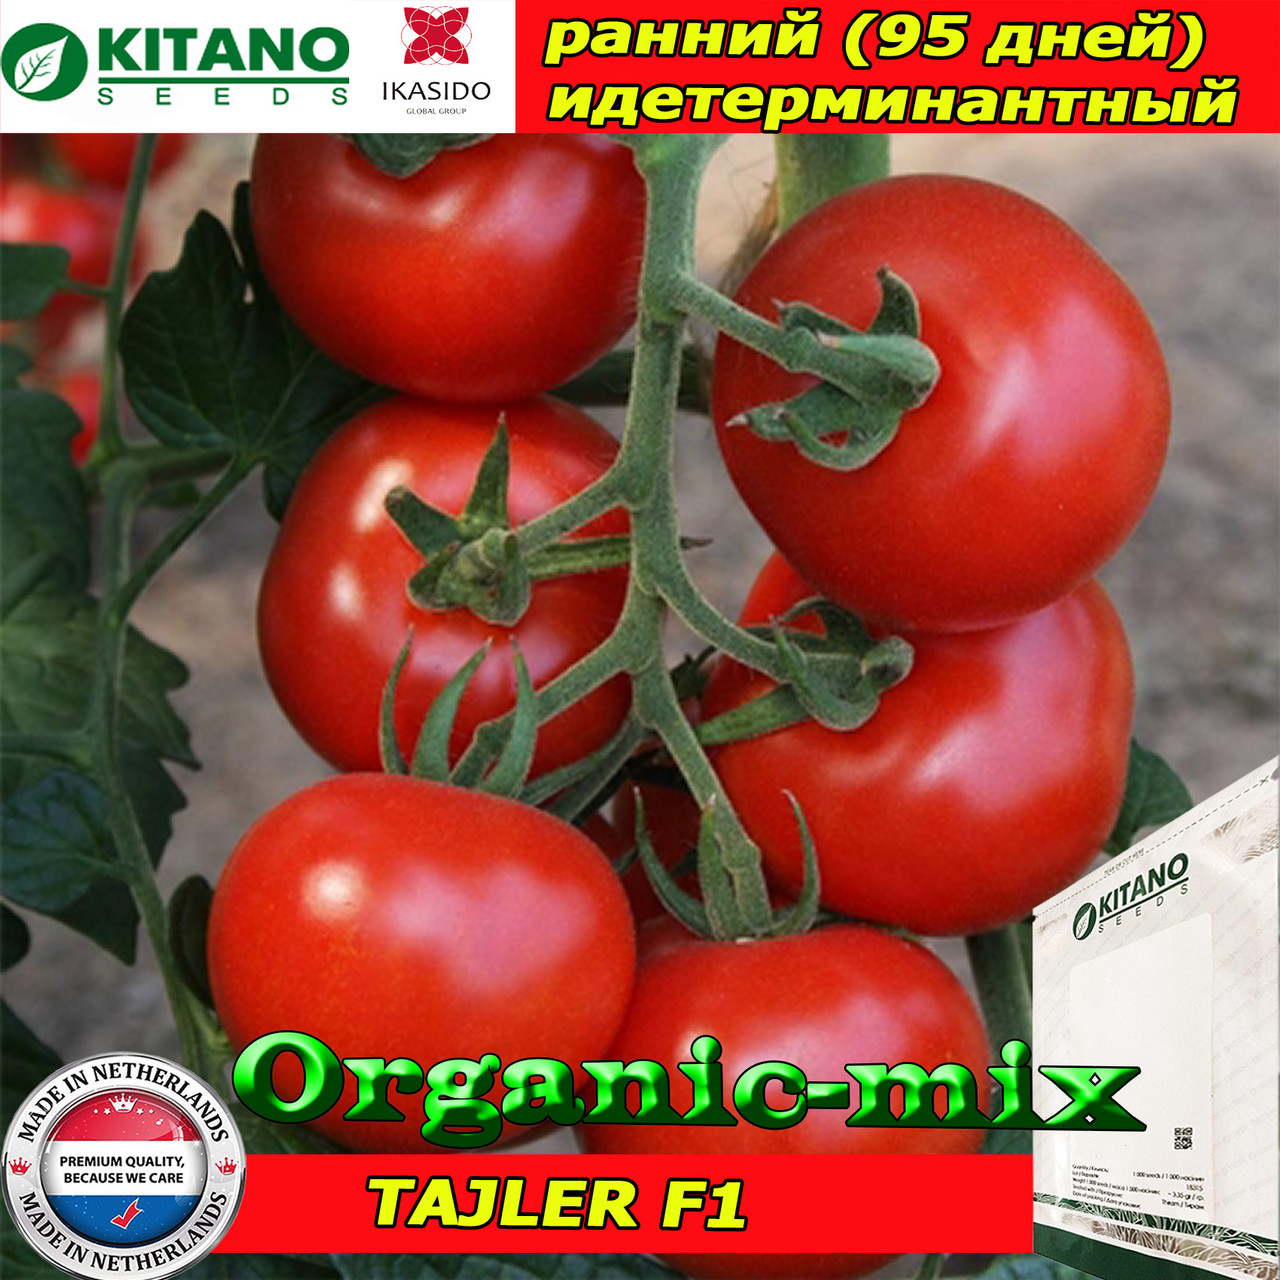 Семена, томат красный ТАЙЛЕР F1 / TAJLER F1, 500 семян, ТМ Kitano Seeds,